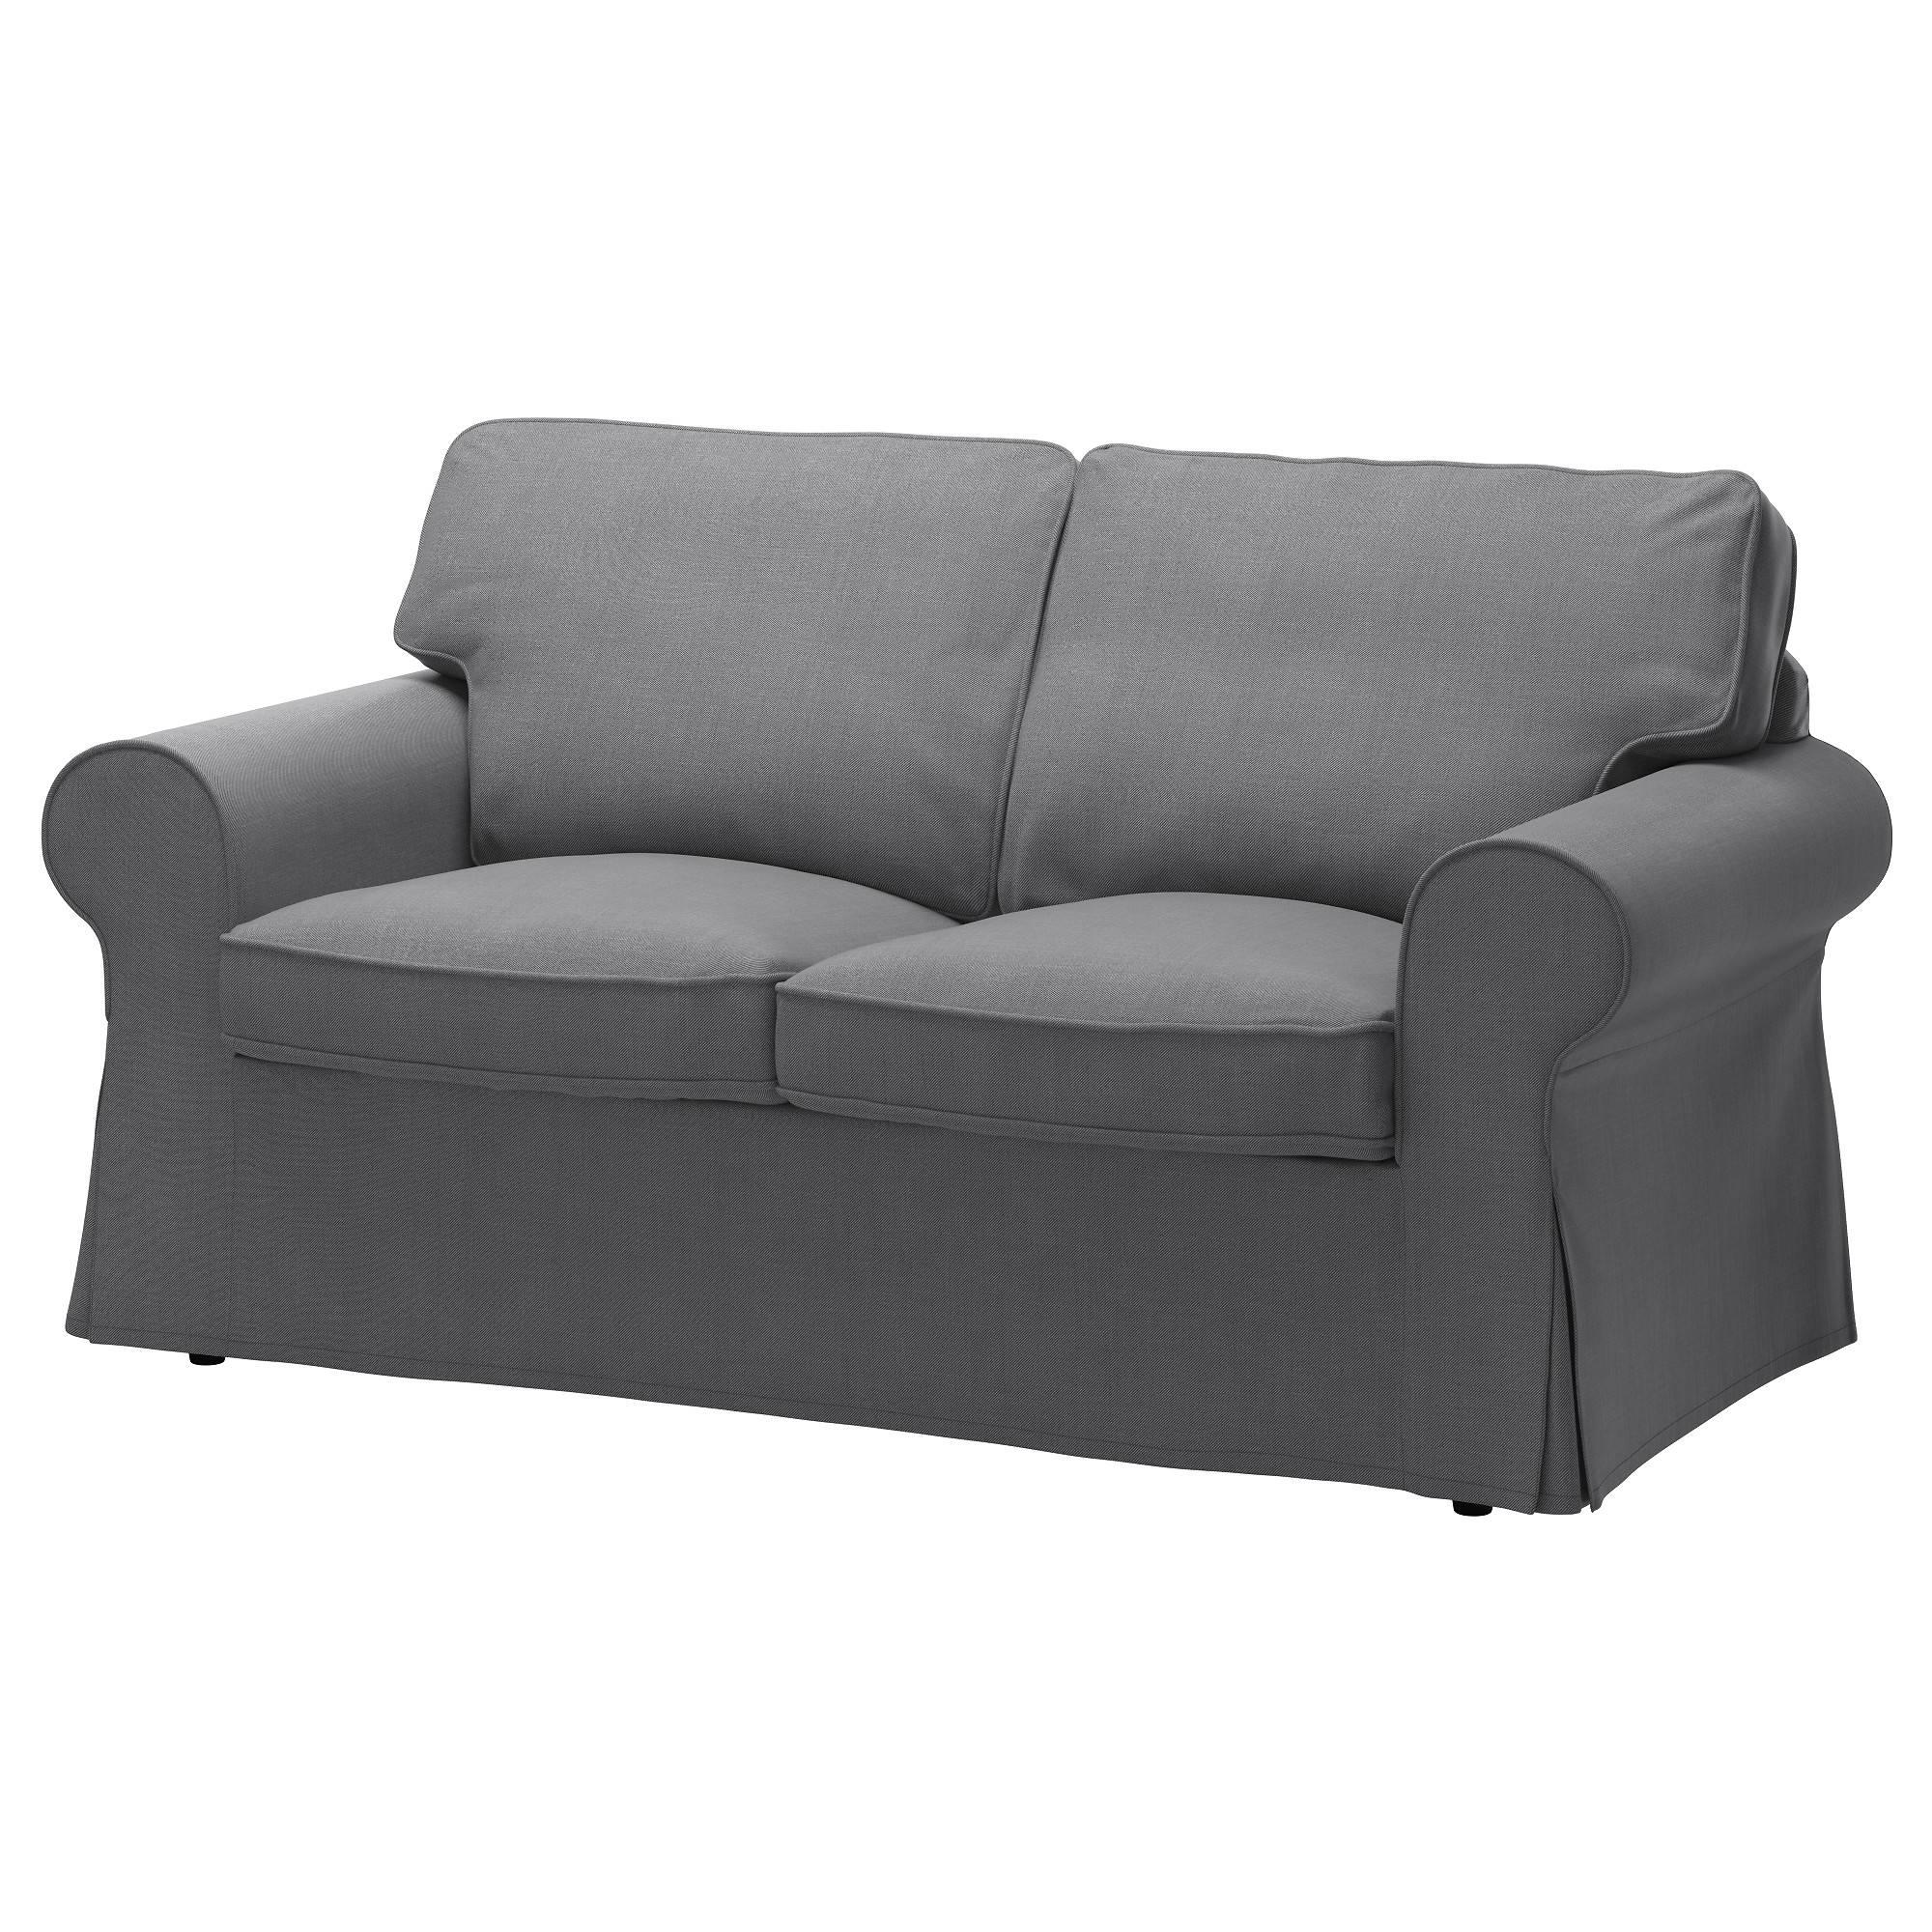 Small Sofa & 2 Seater Sofa | Ikea Throughout Small 2 Seater Sofas (View 19 of 30)